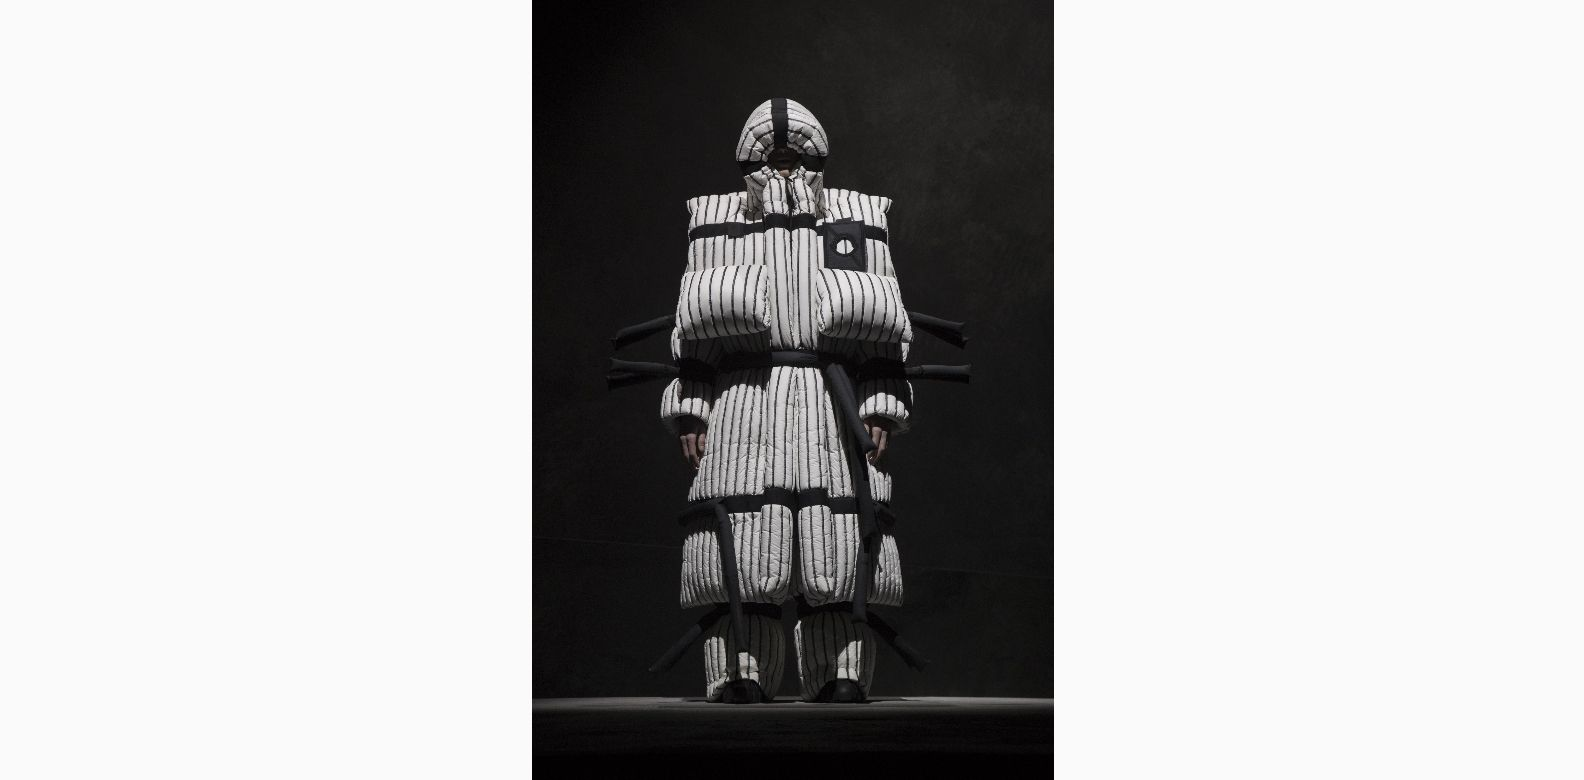 5. Moncler Craig Green - Dress as Habitat - Fall/Winter 2018